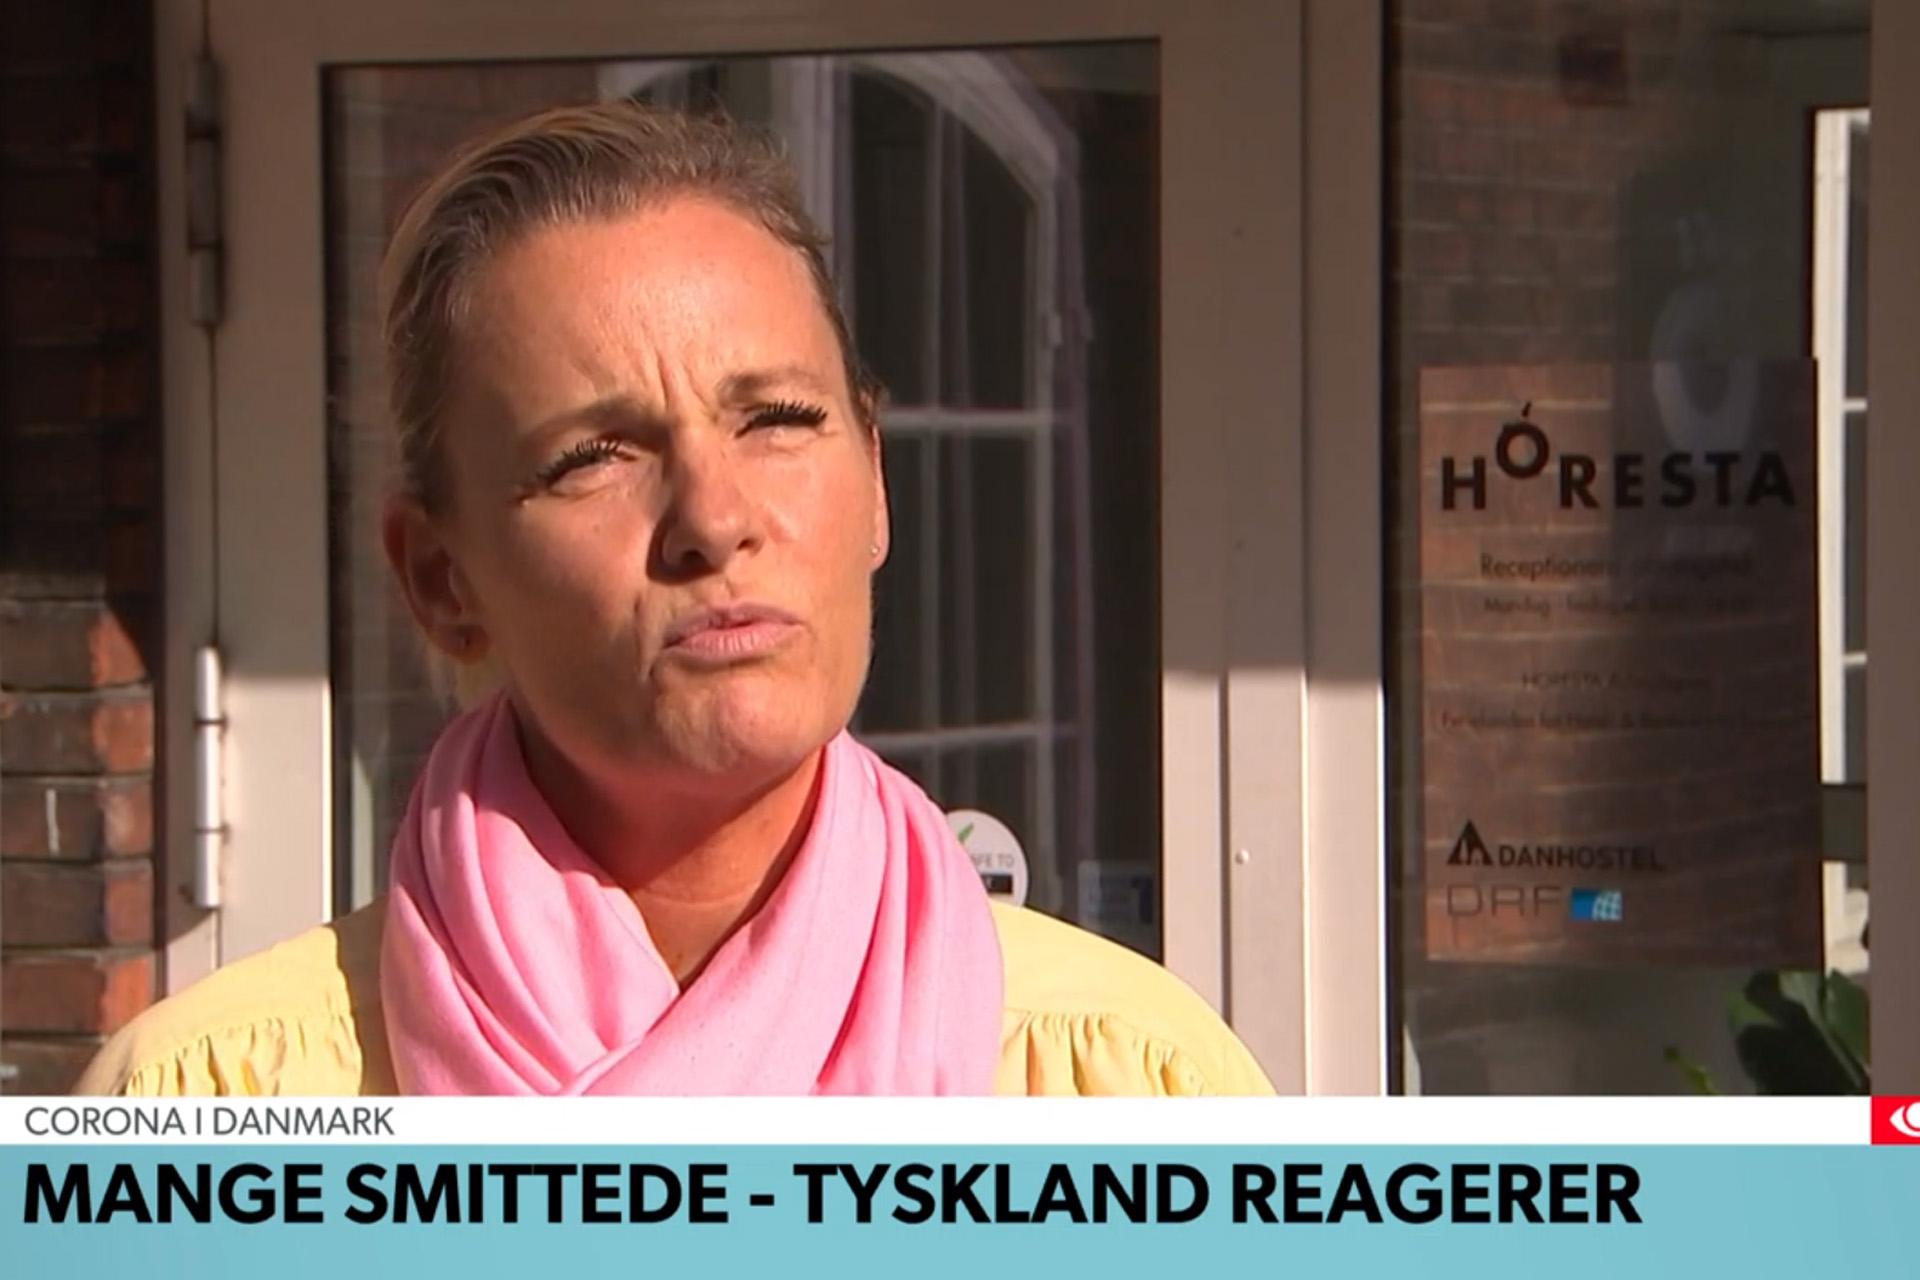 Horesta Tyske Rejserestriktioner Kan Koste Dyrt